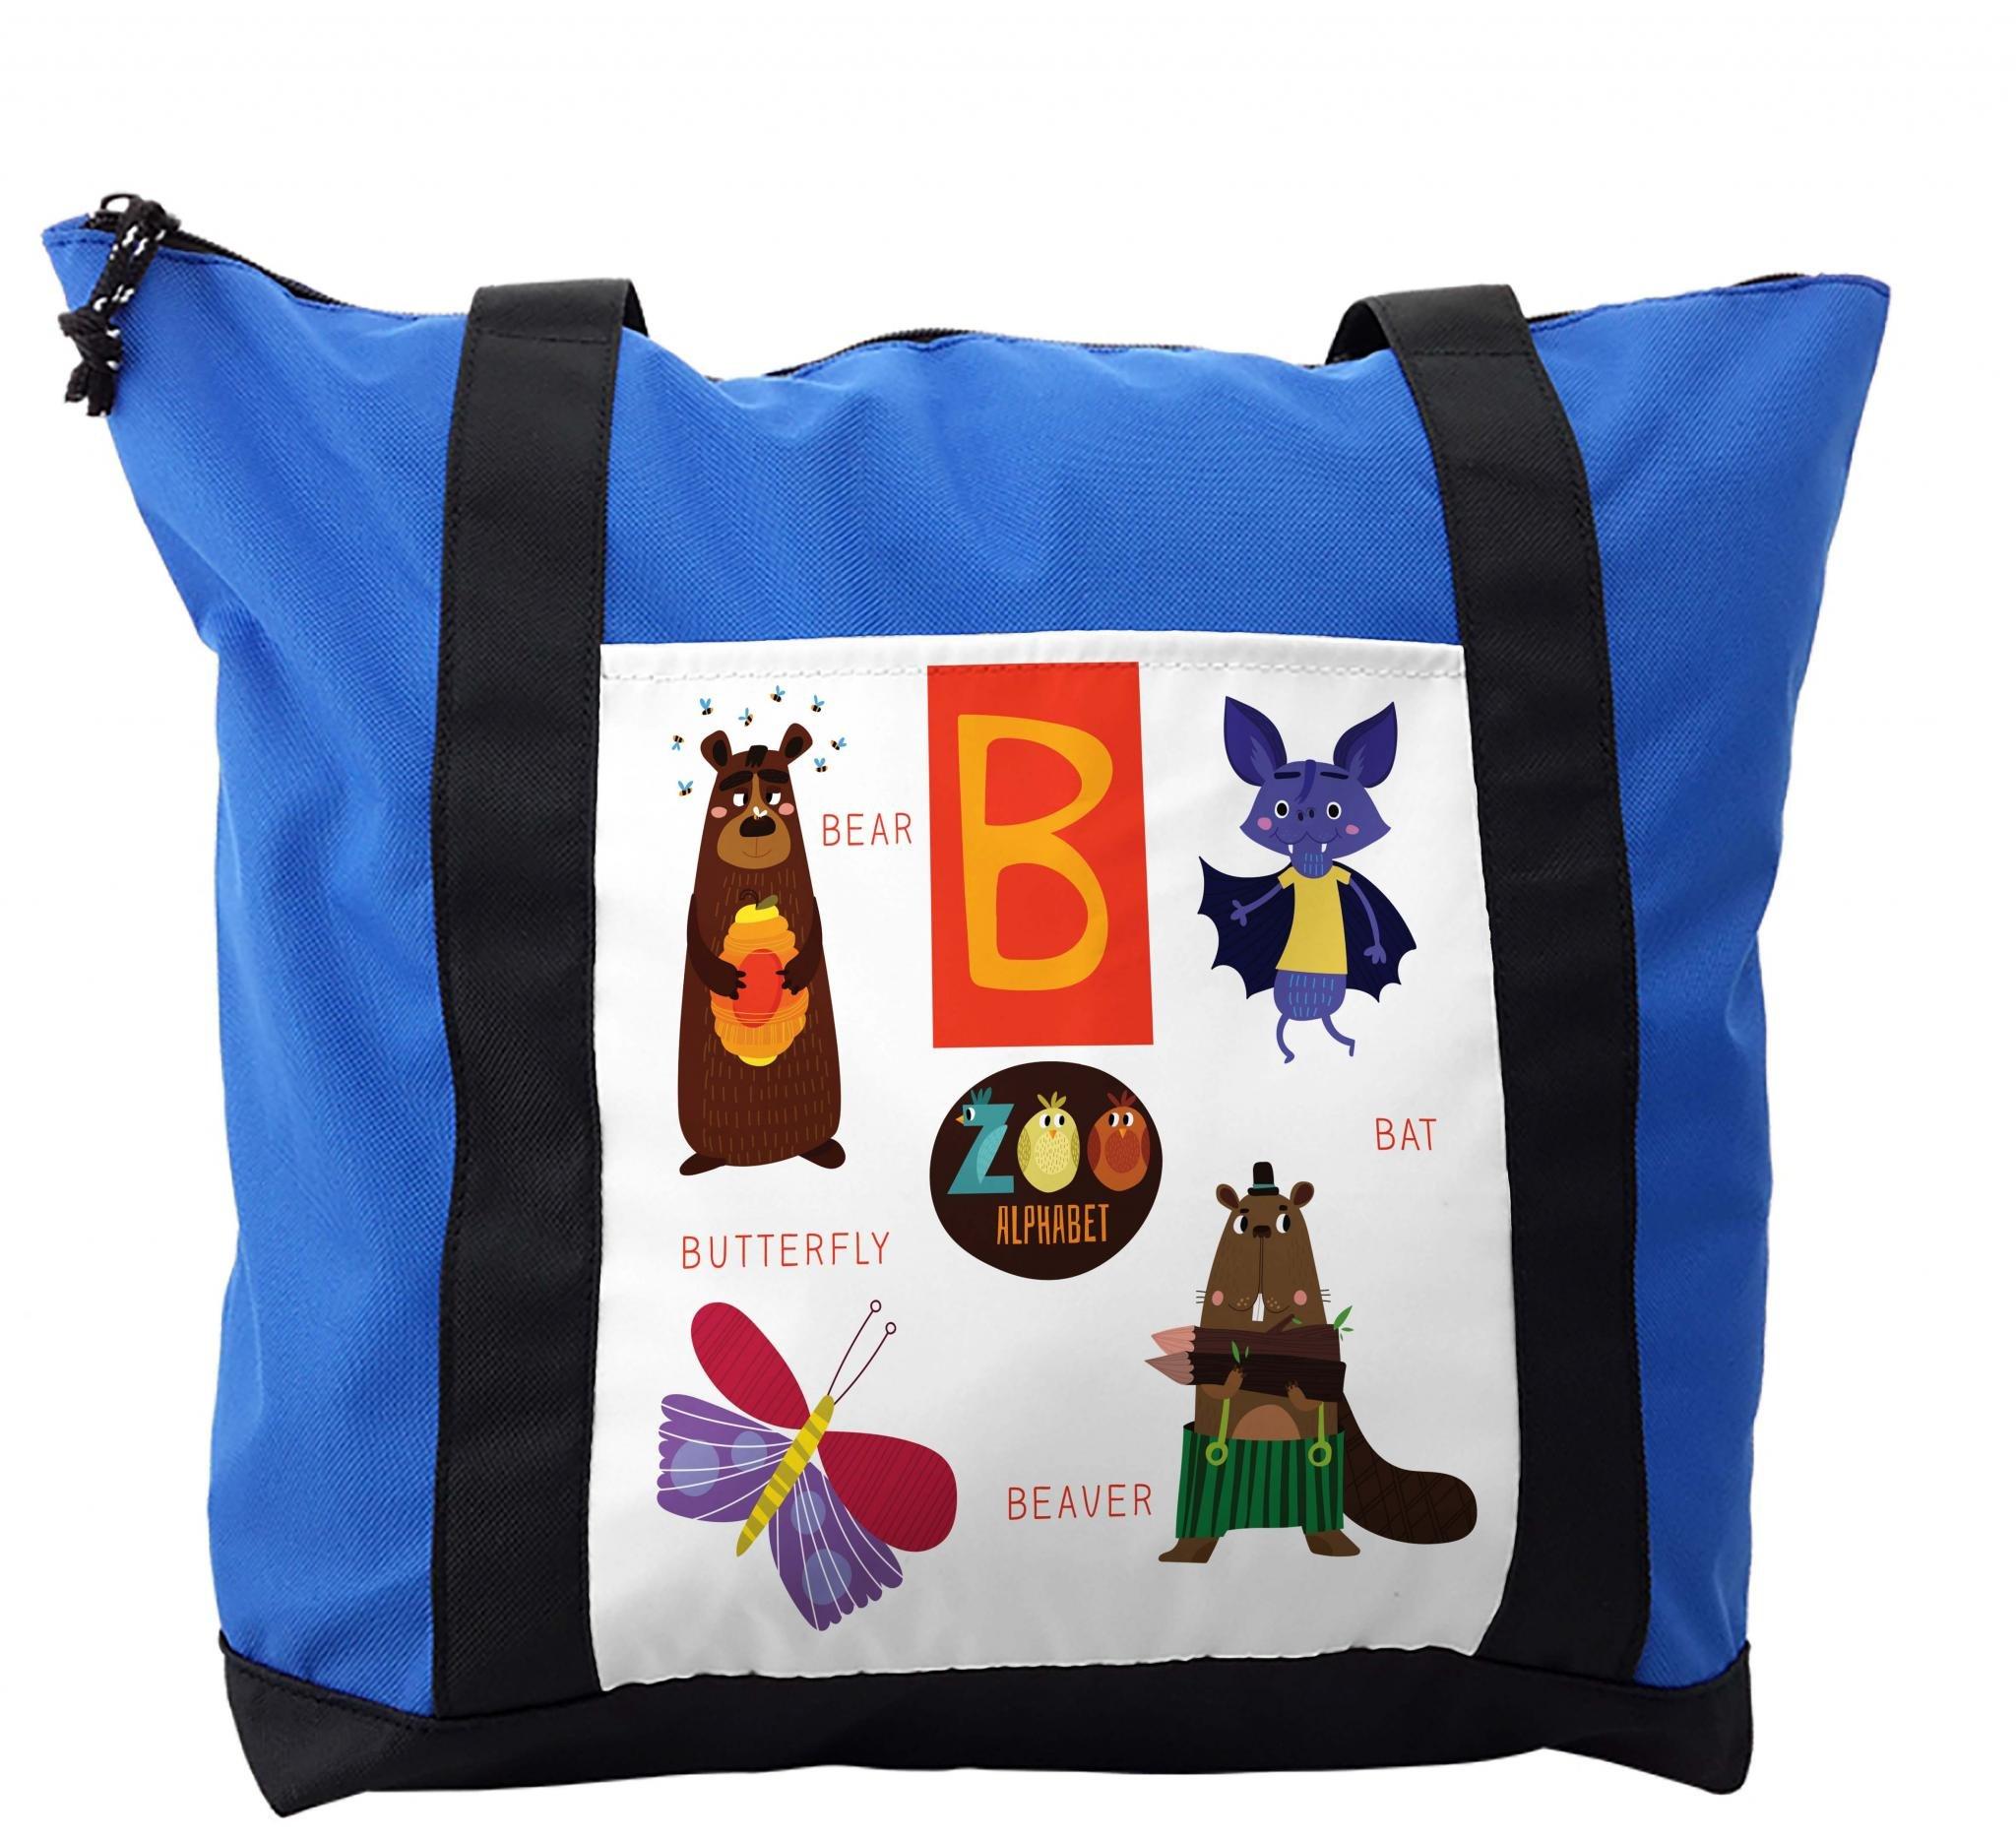 Lunarable ABC Kids Shoulder Bag, Bat Butterfly and Beaver, Durable with Zipper